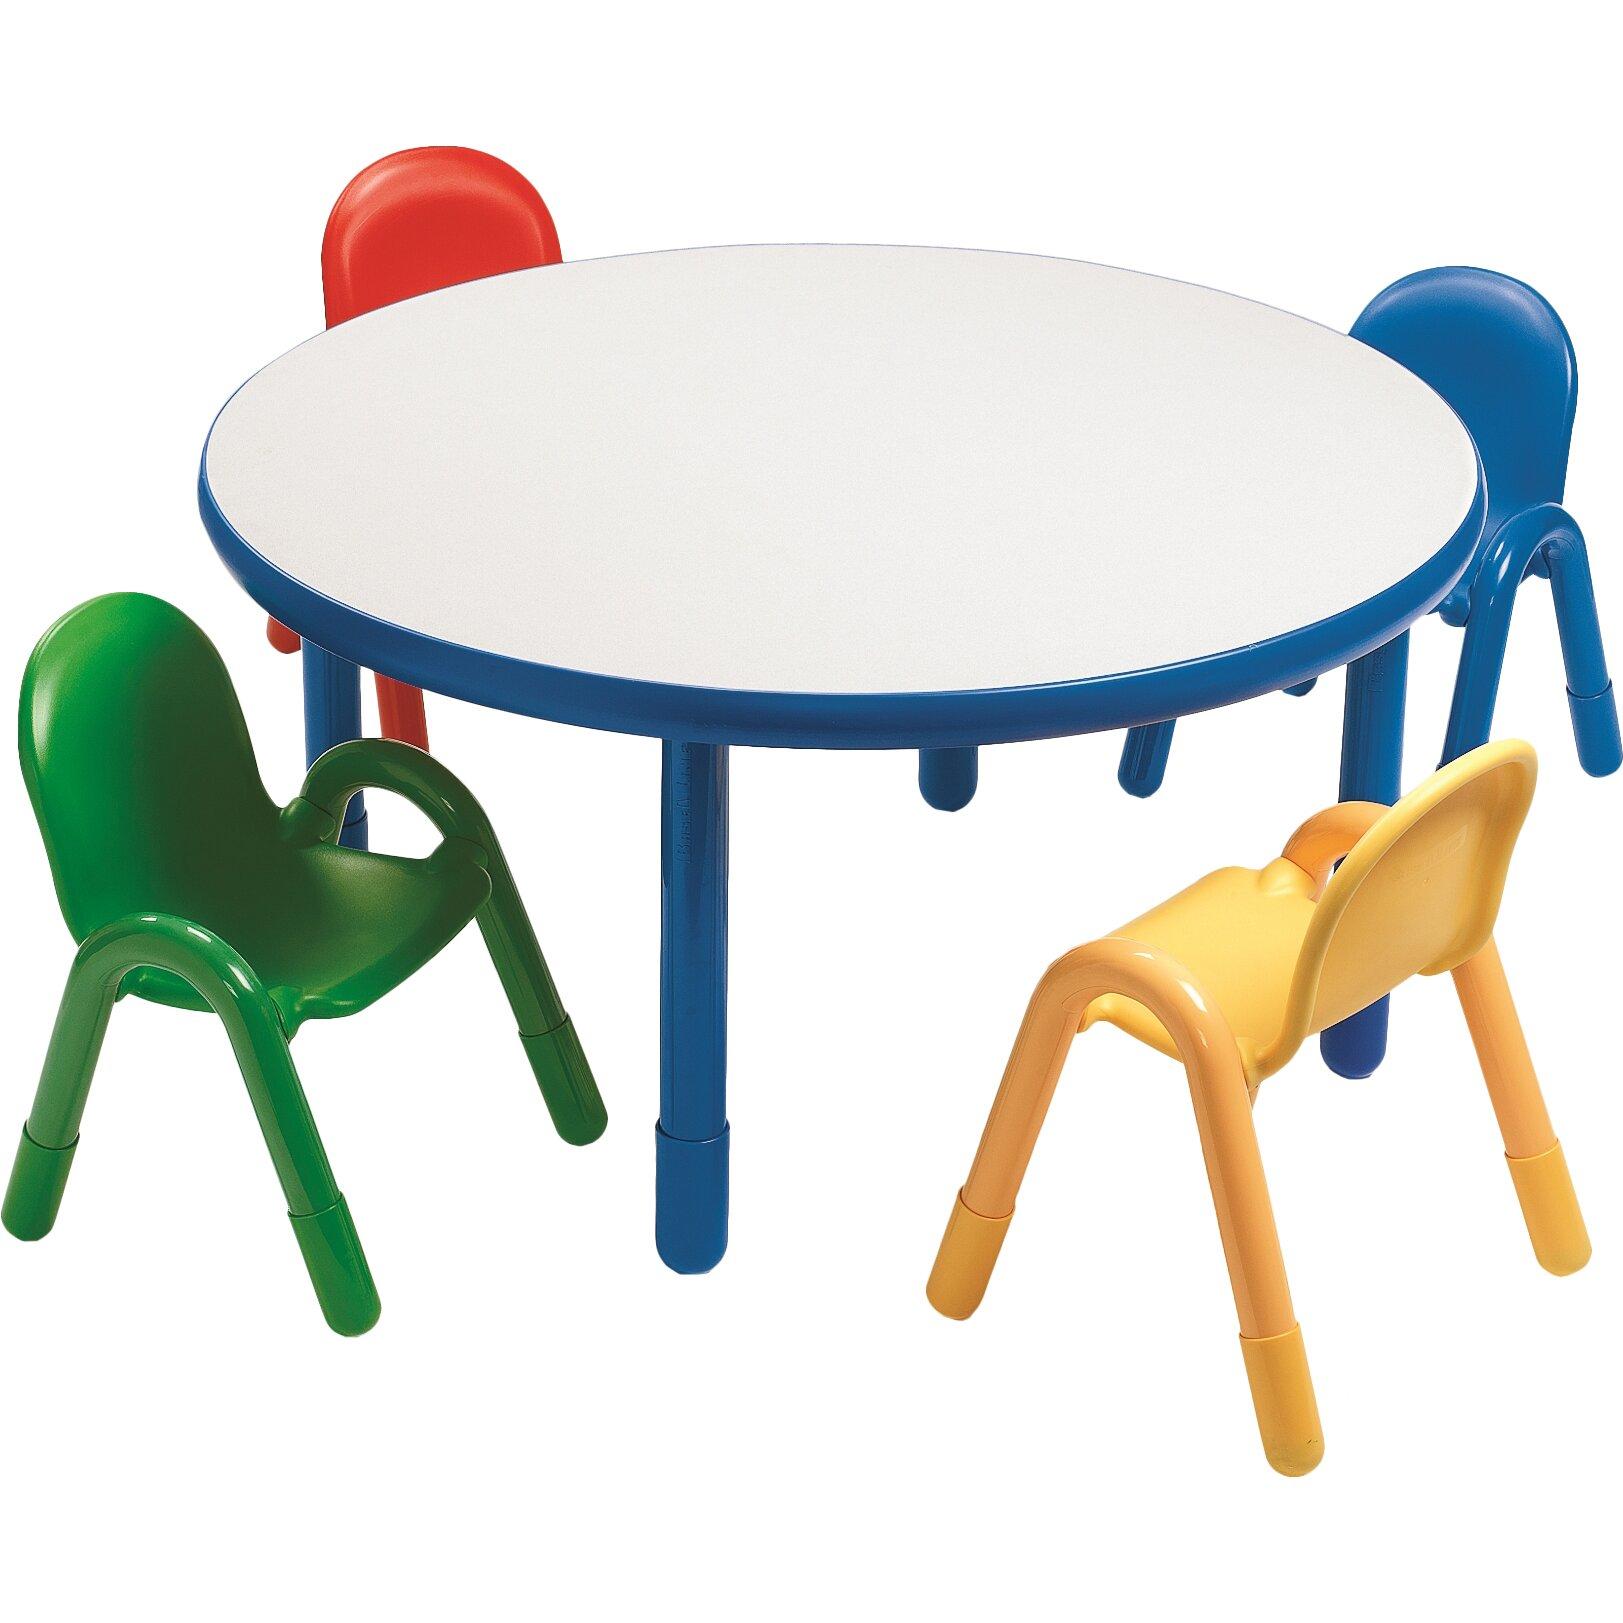 preschool chair angeles baseline preschool table and chair set in 131